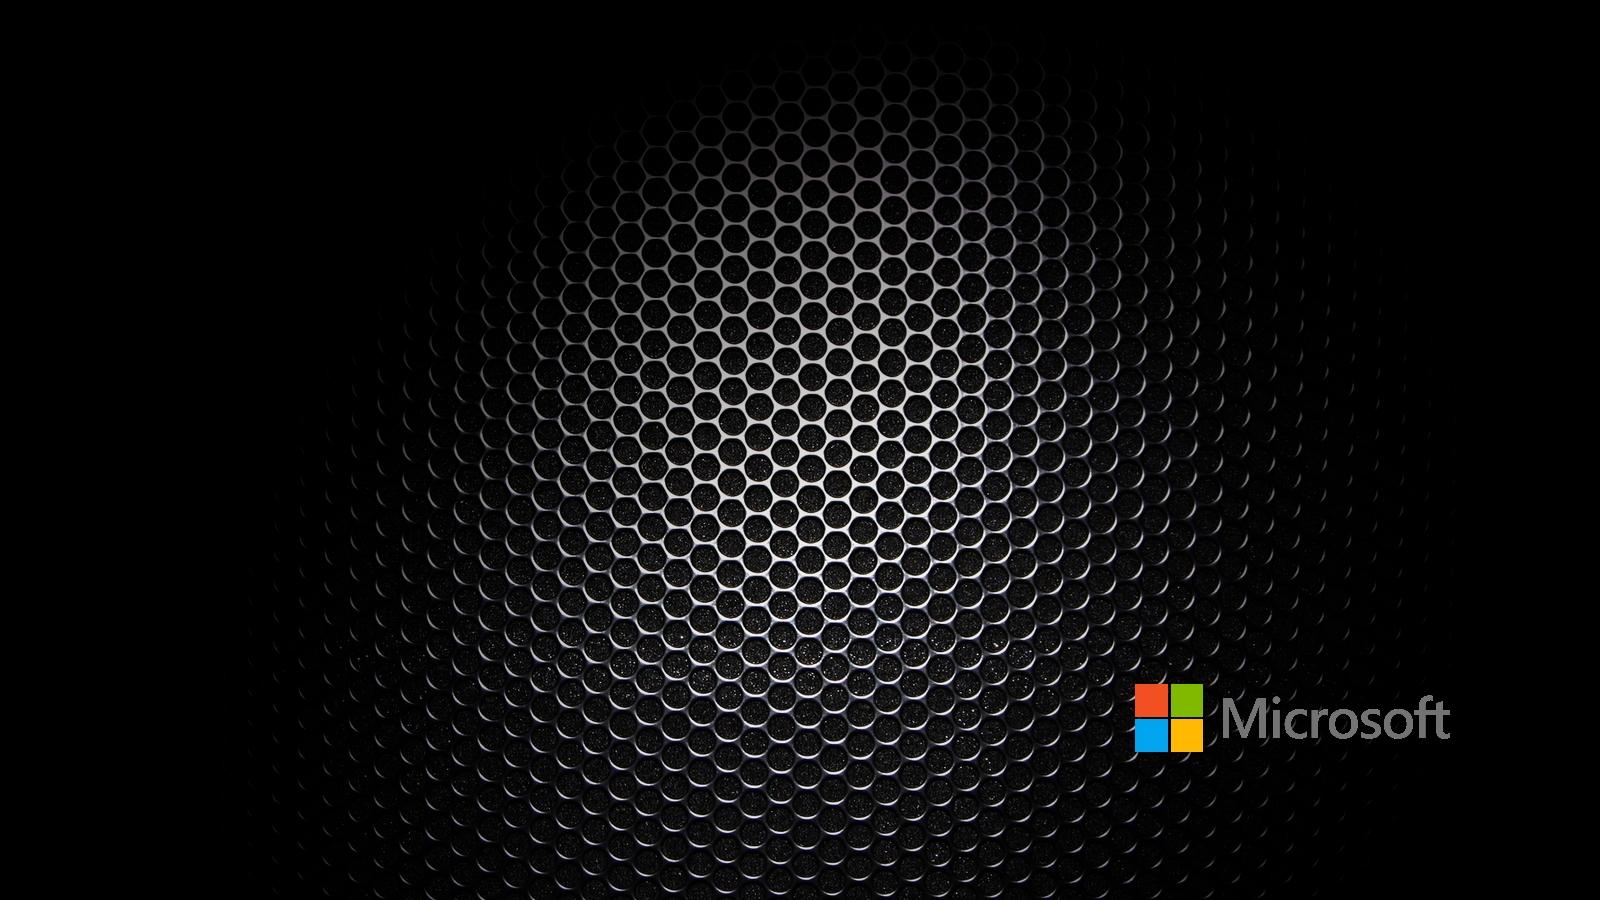 Eyesurfing Microsoft Logo Wallpaper 2013 1600x900